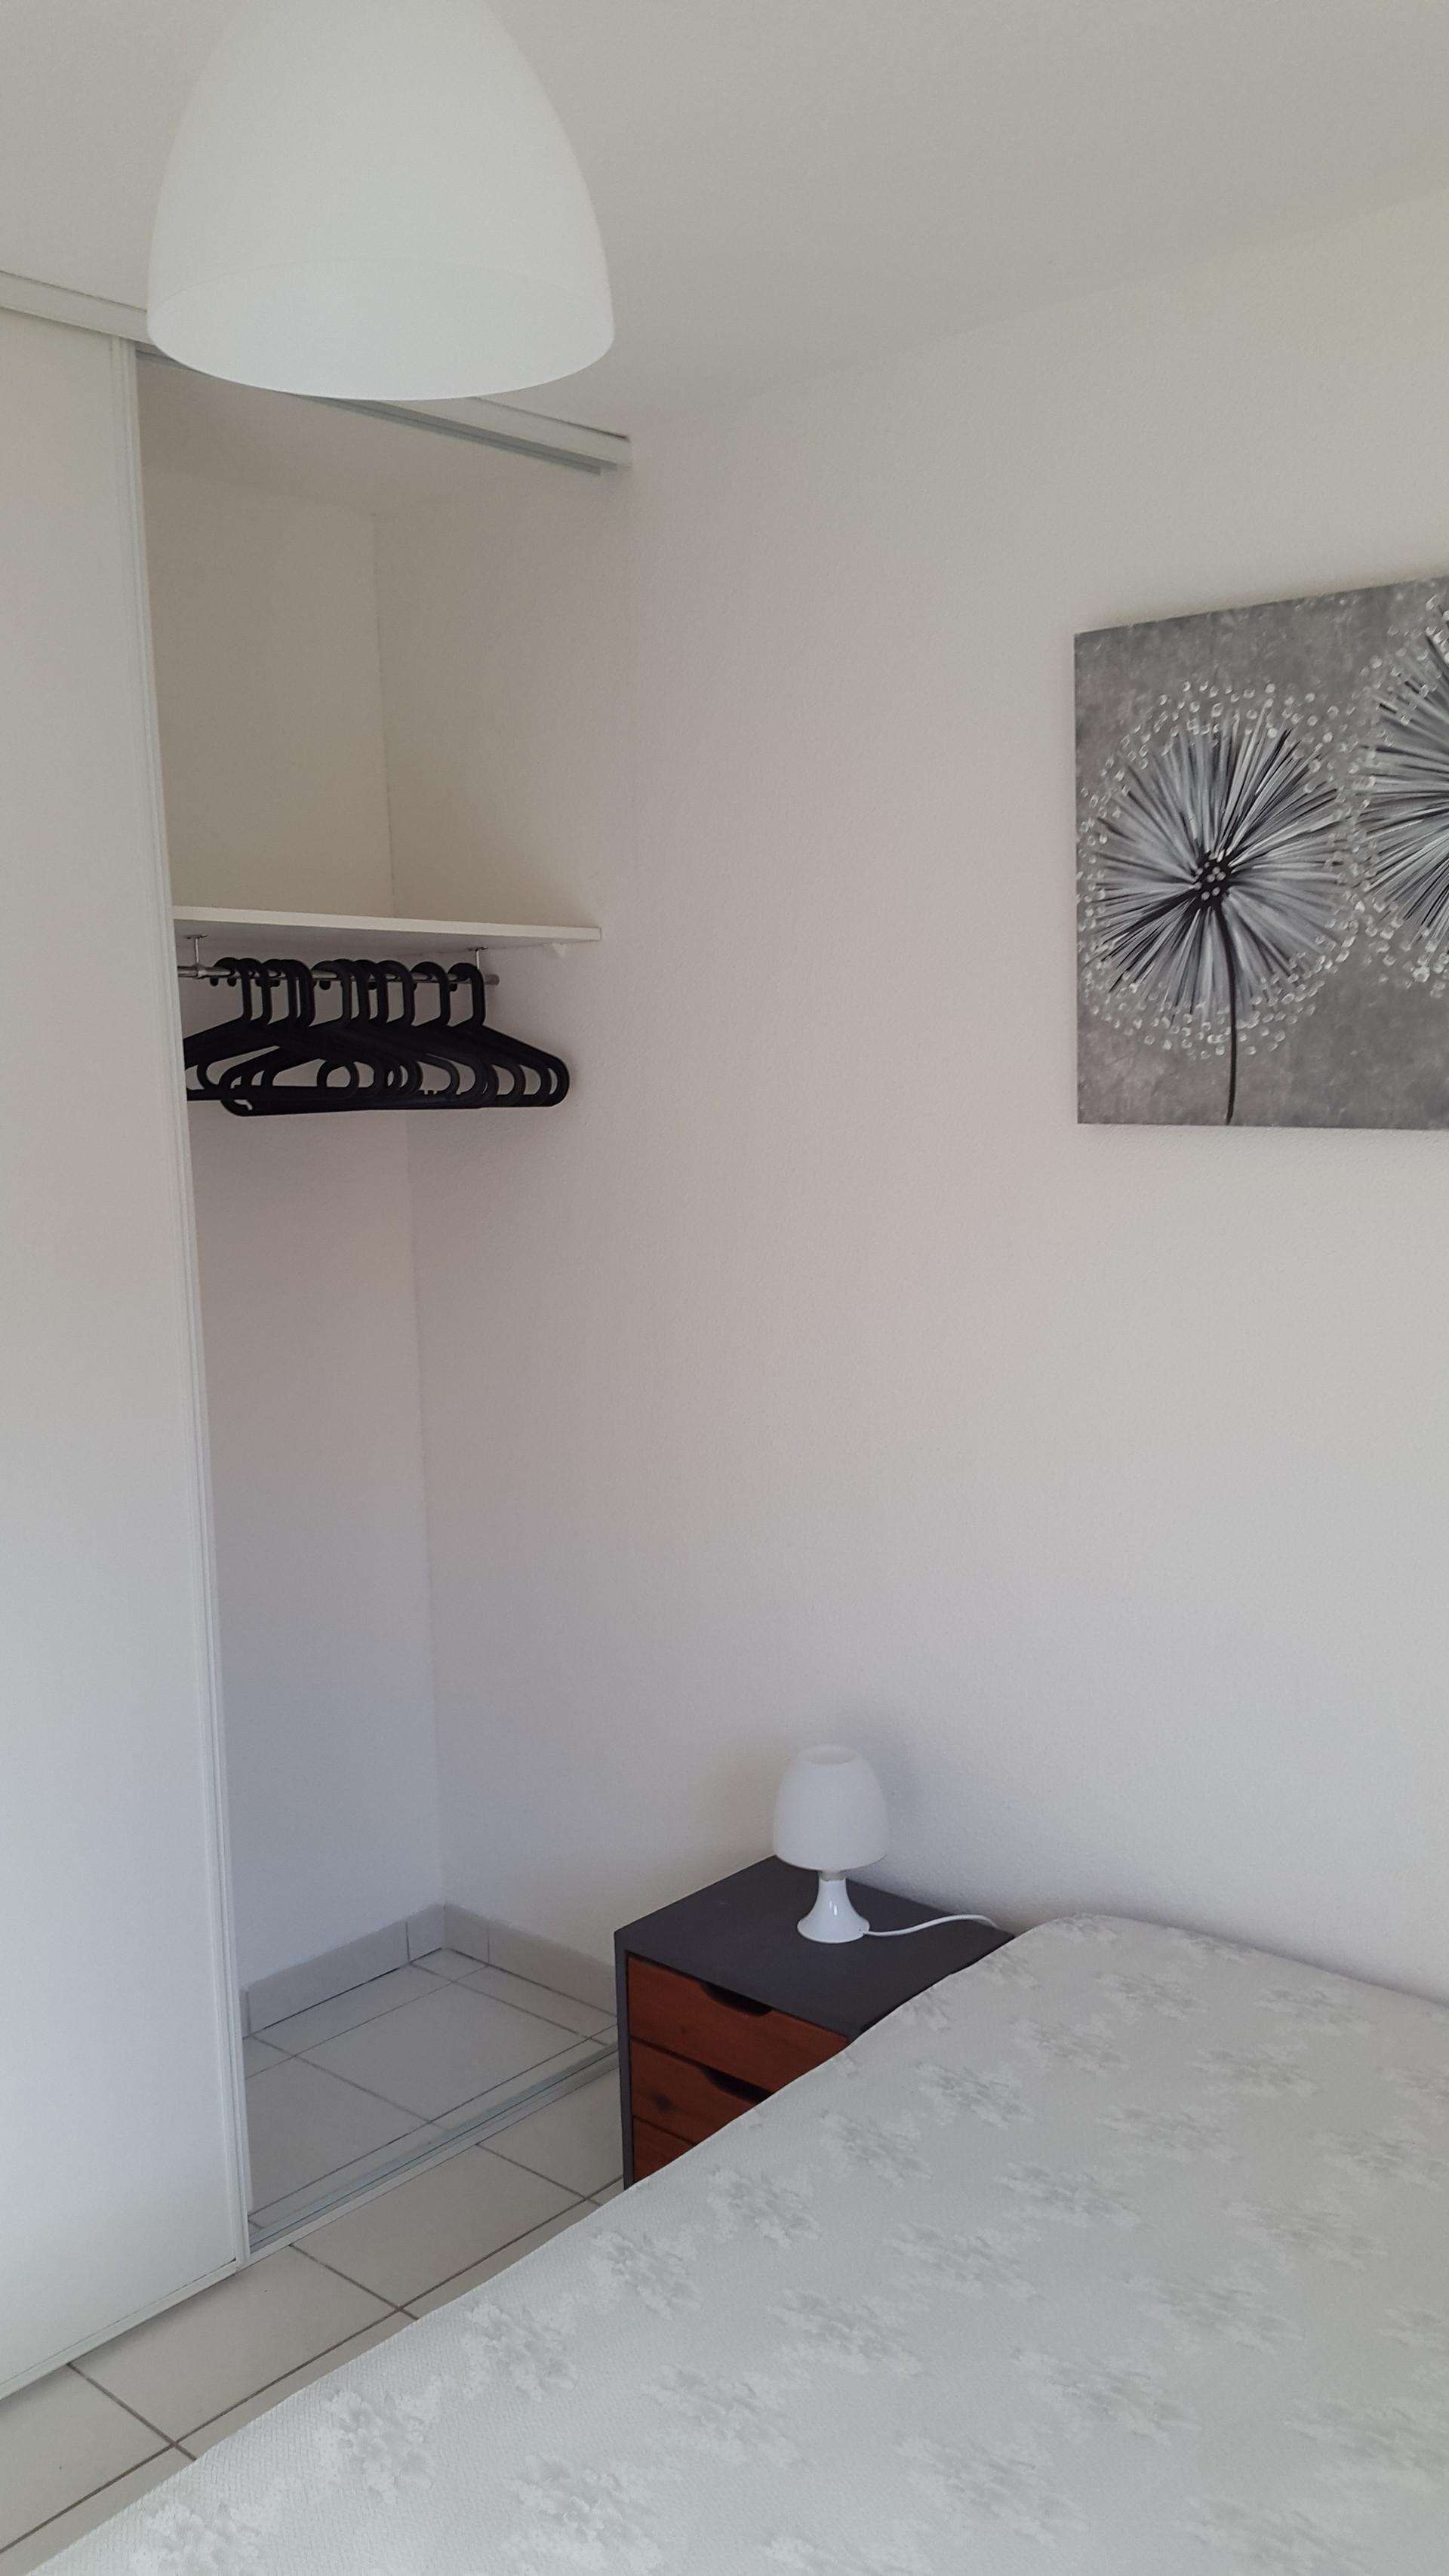 appartement-residence-calme-piscine-6d023fb89c0dde491e1591c0c9cfee07